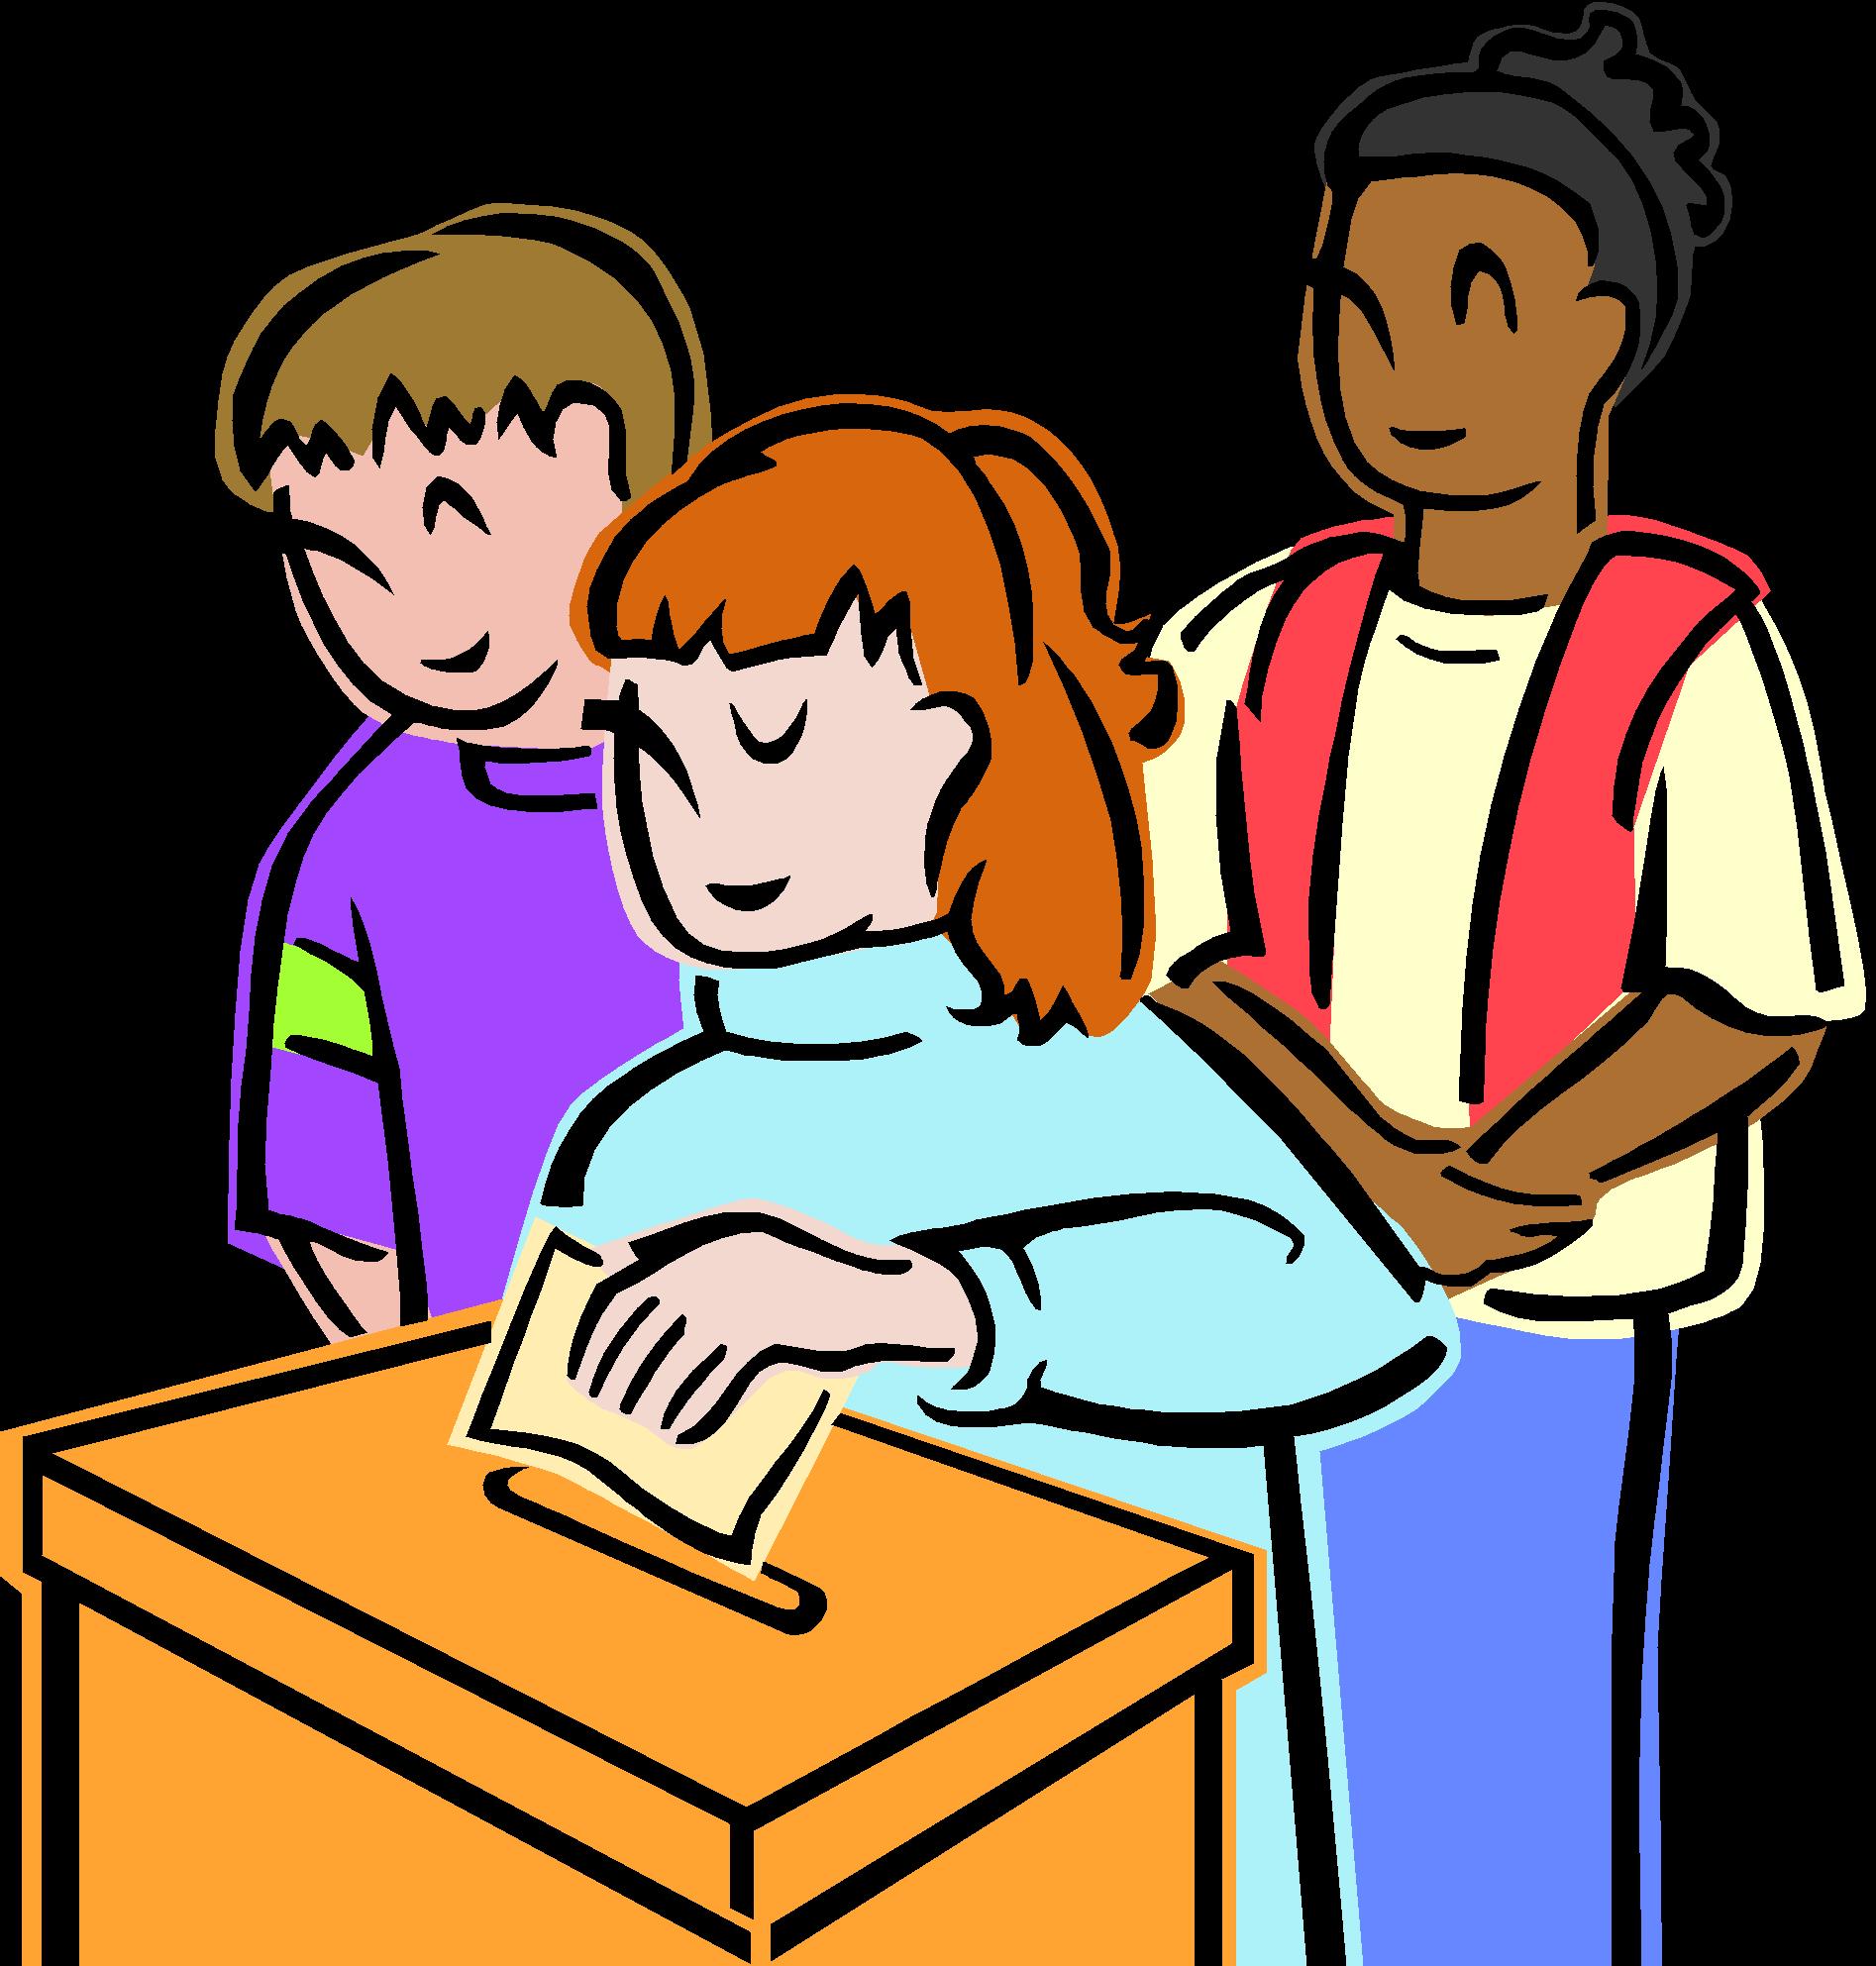 Voting clipart student. Elem educ